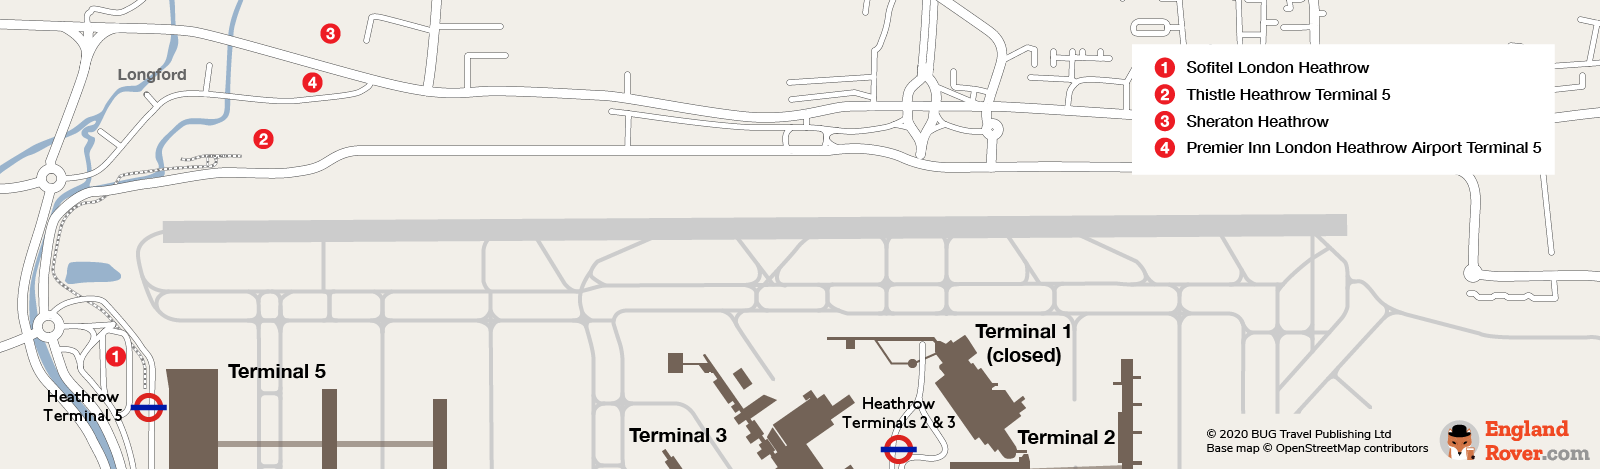 Heathrow Airport Terminal 5 hotels